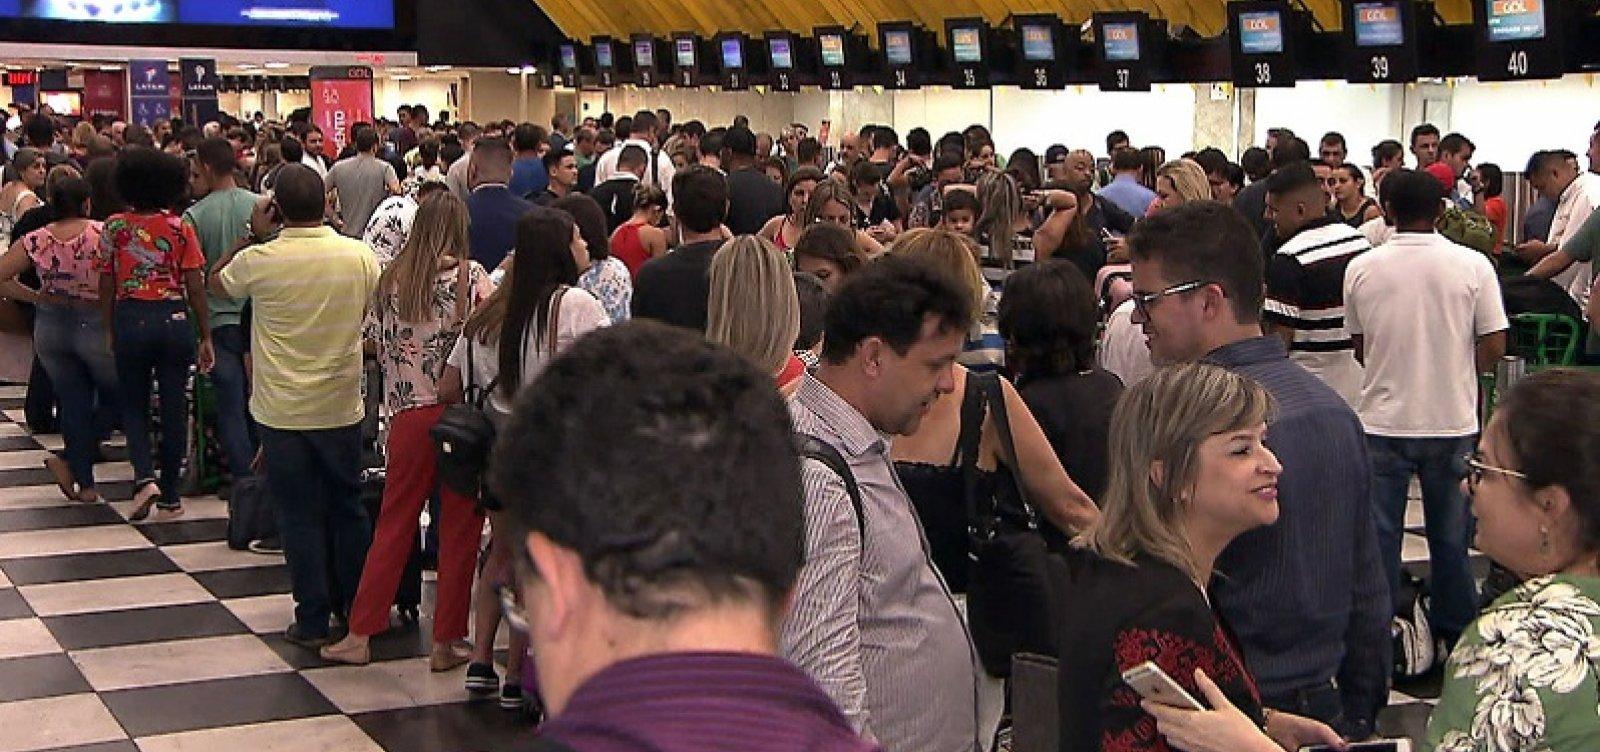 [Aeroporto de Congonhas tem filas após chuva fechar terminal]